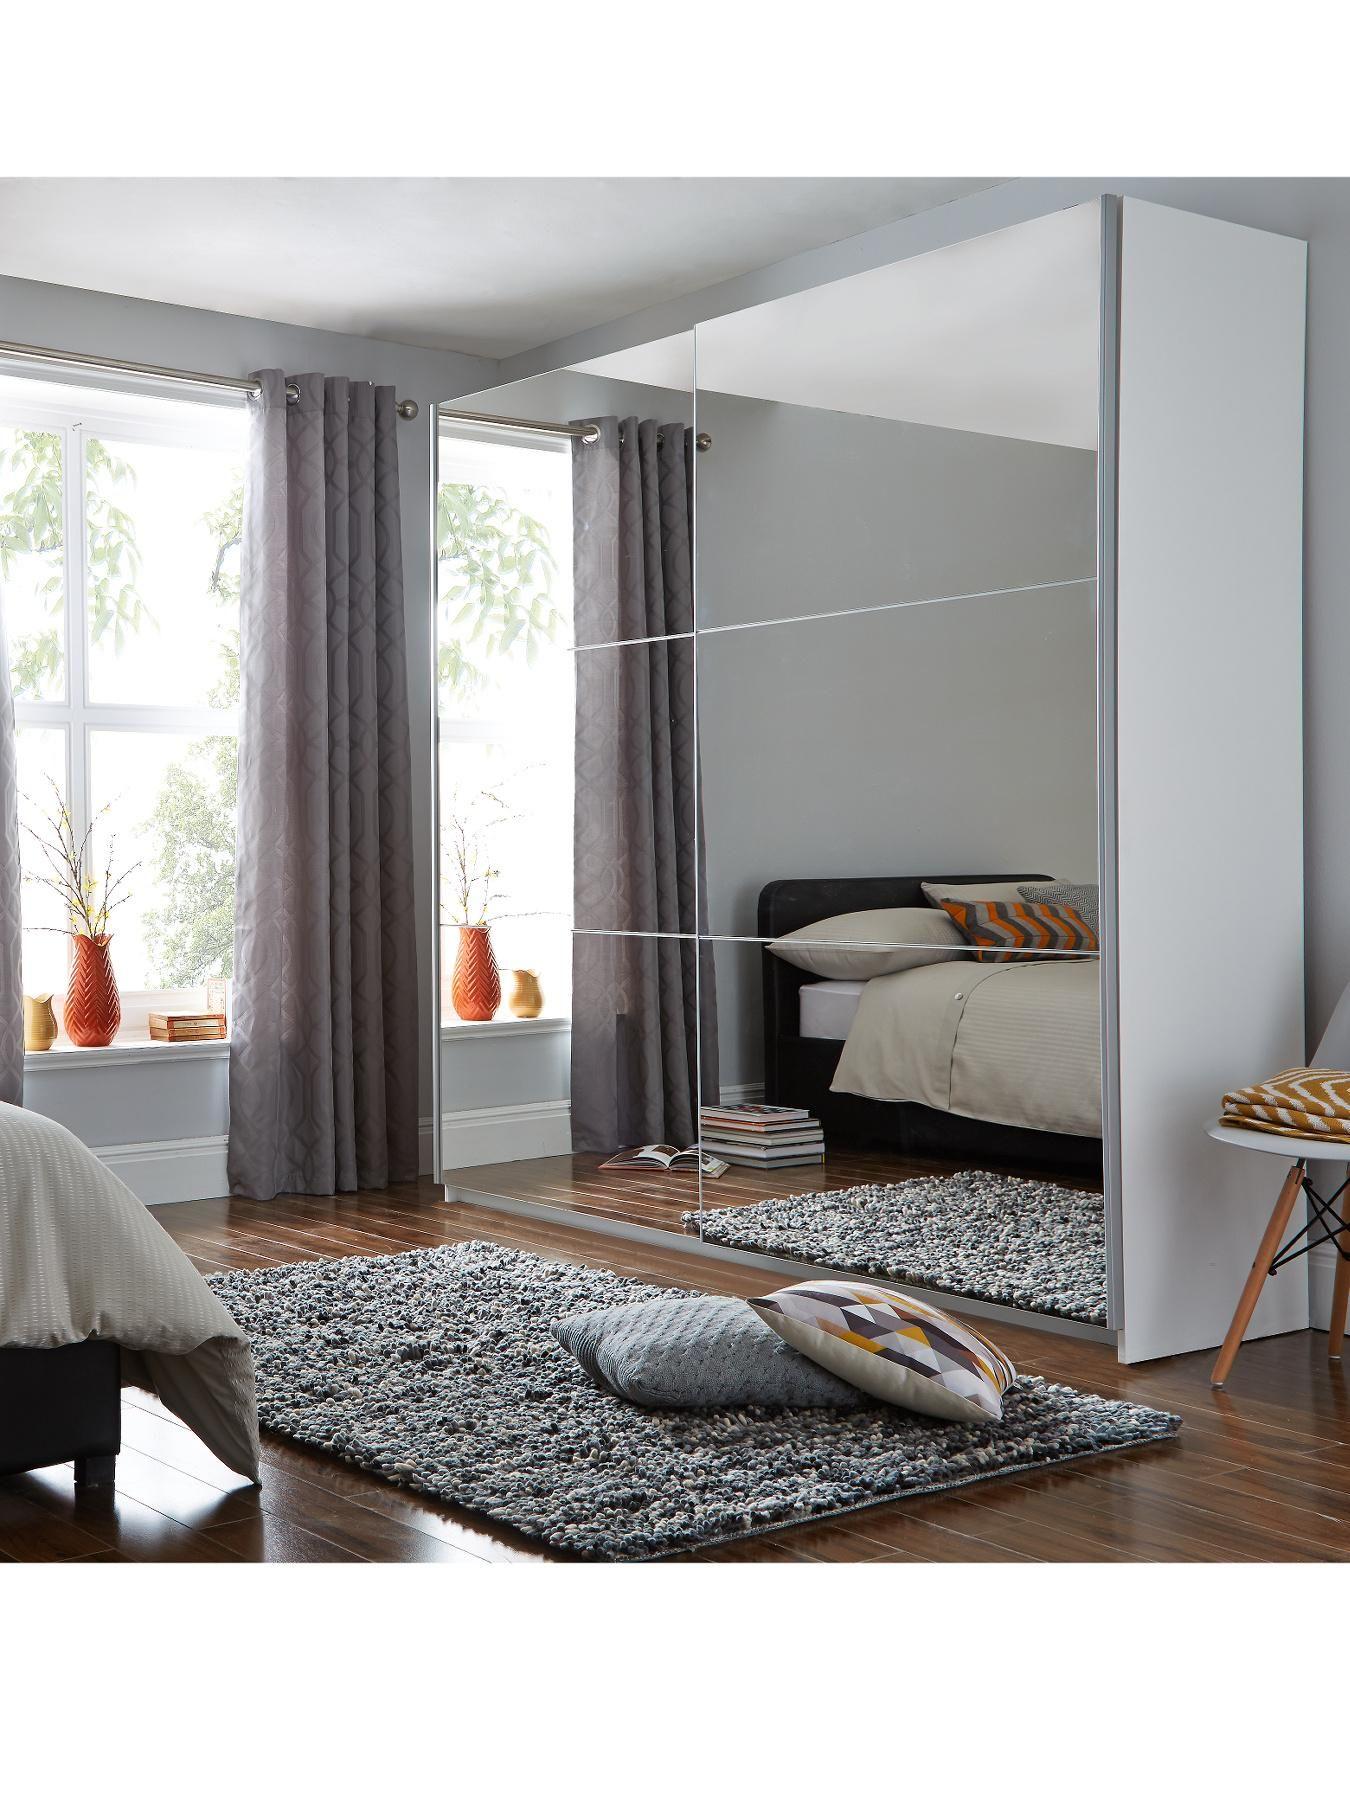 Universal Large Sliding Door Mirrored Wardrobe Veshje Pinterest